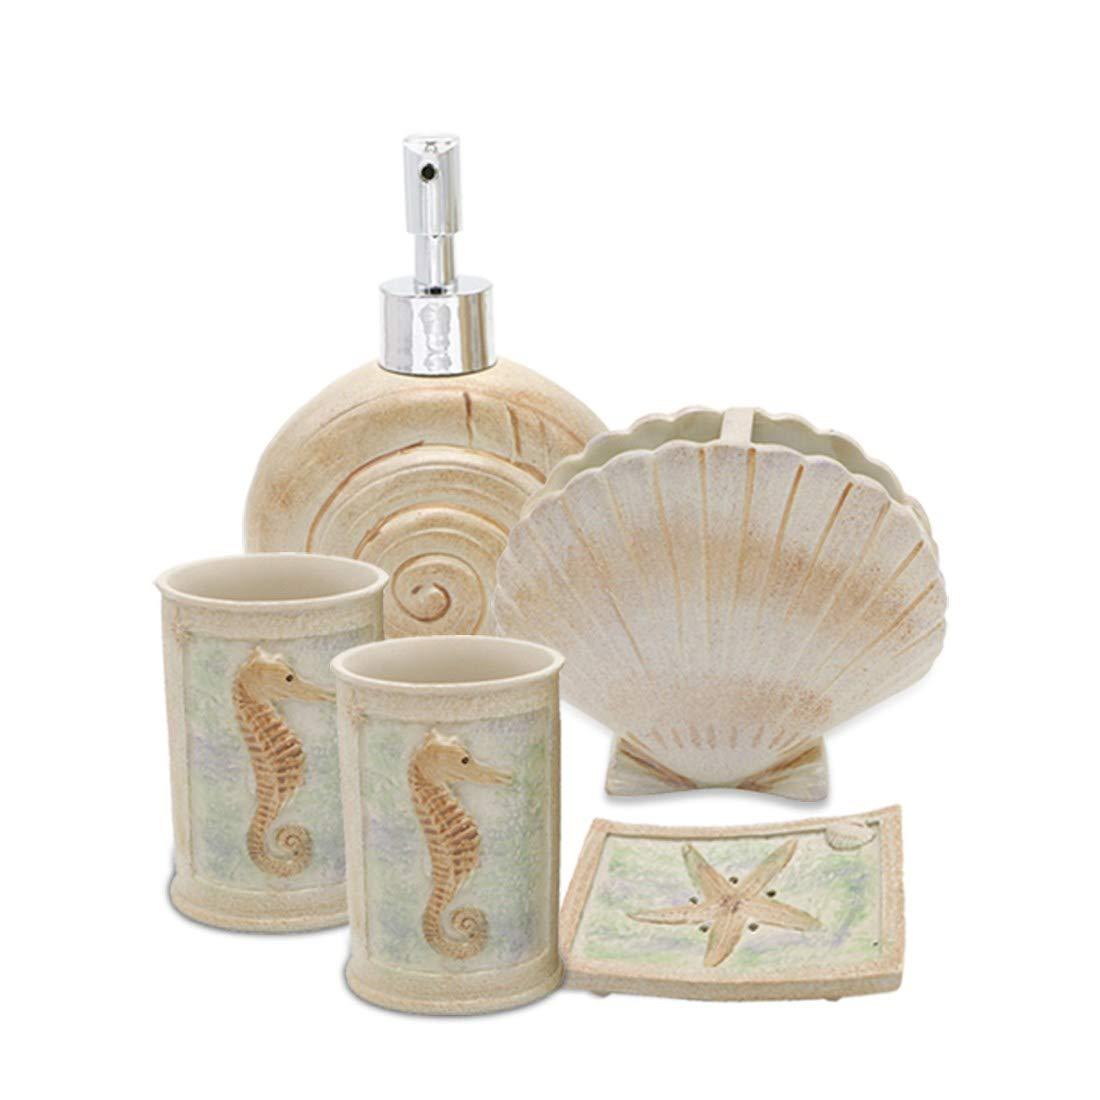 Creative Scents 5 Piece Bathroom Accessory Set, Hotsan Beach Seashells Ensemble Set Includs Soap Dispenser, Soap Dish, Tumble, Toothbrush Holder - Ivory Polyresin Set for Man, Woman, Kids